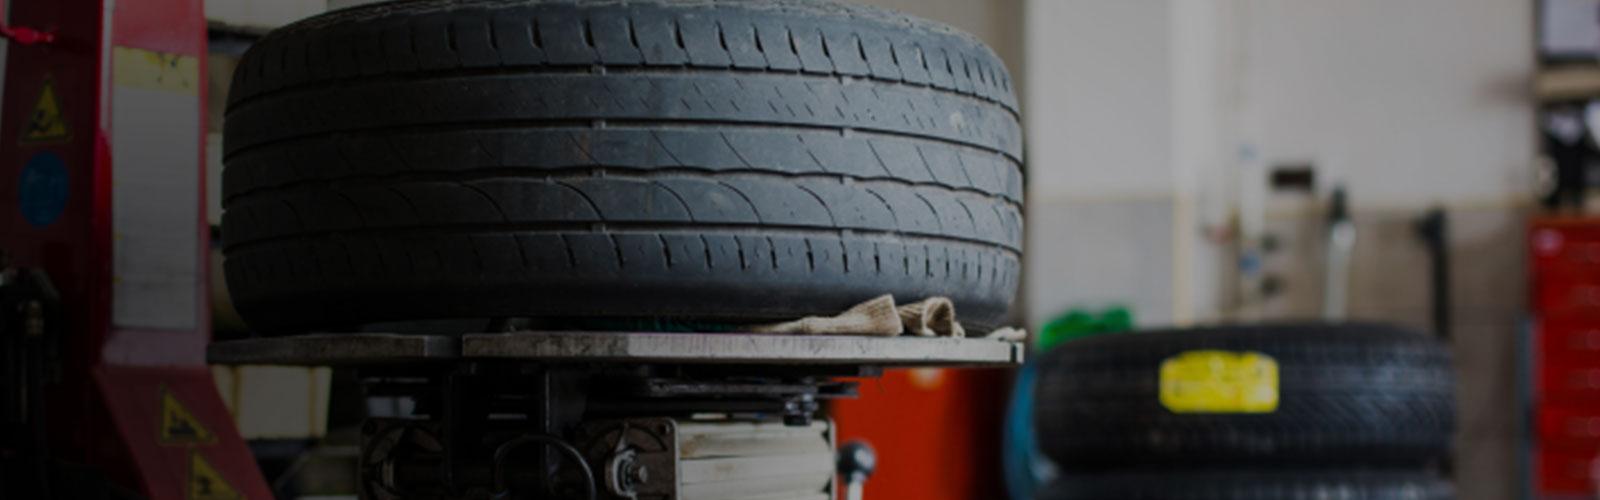 Ken S Tire Auto Service Expert Auto Repair Allegan Mi 49010